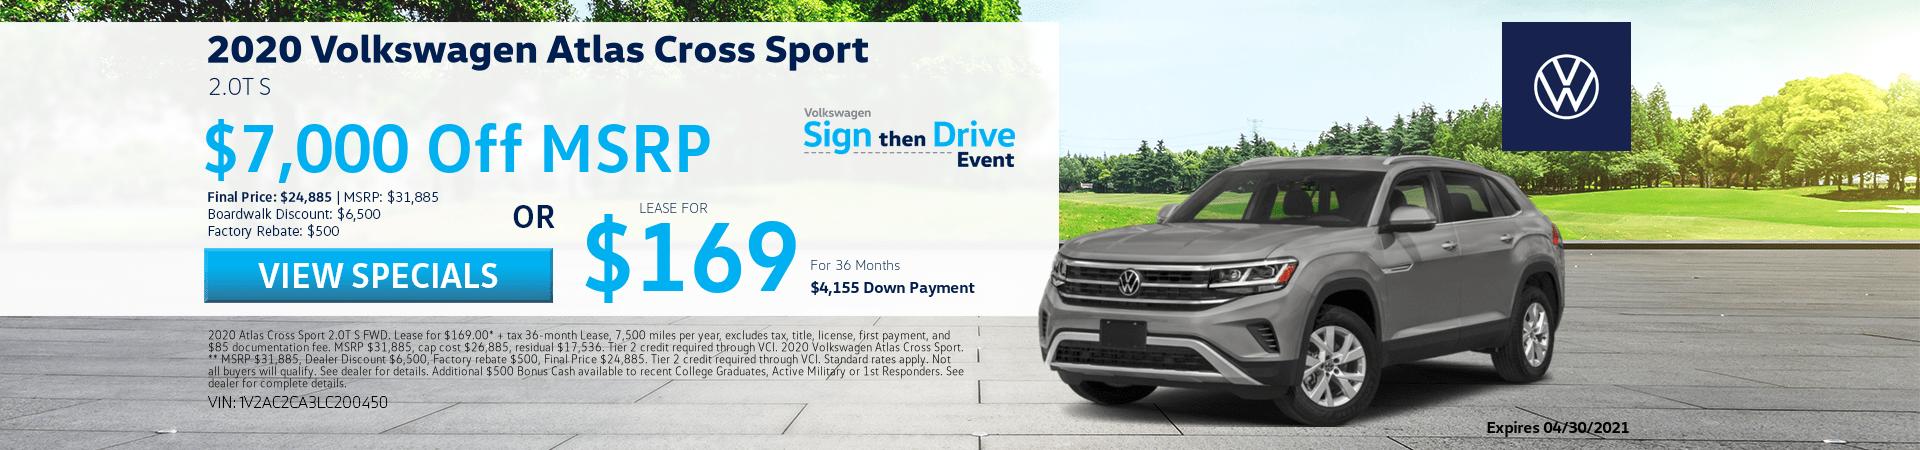 2020-Volkswagen-Atlas-Cross-Sport-2-min